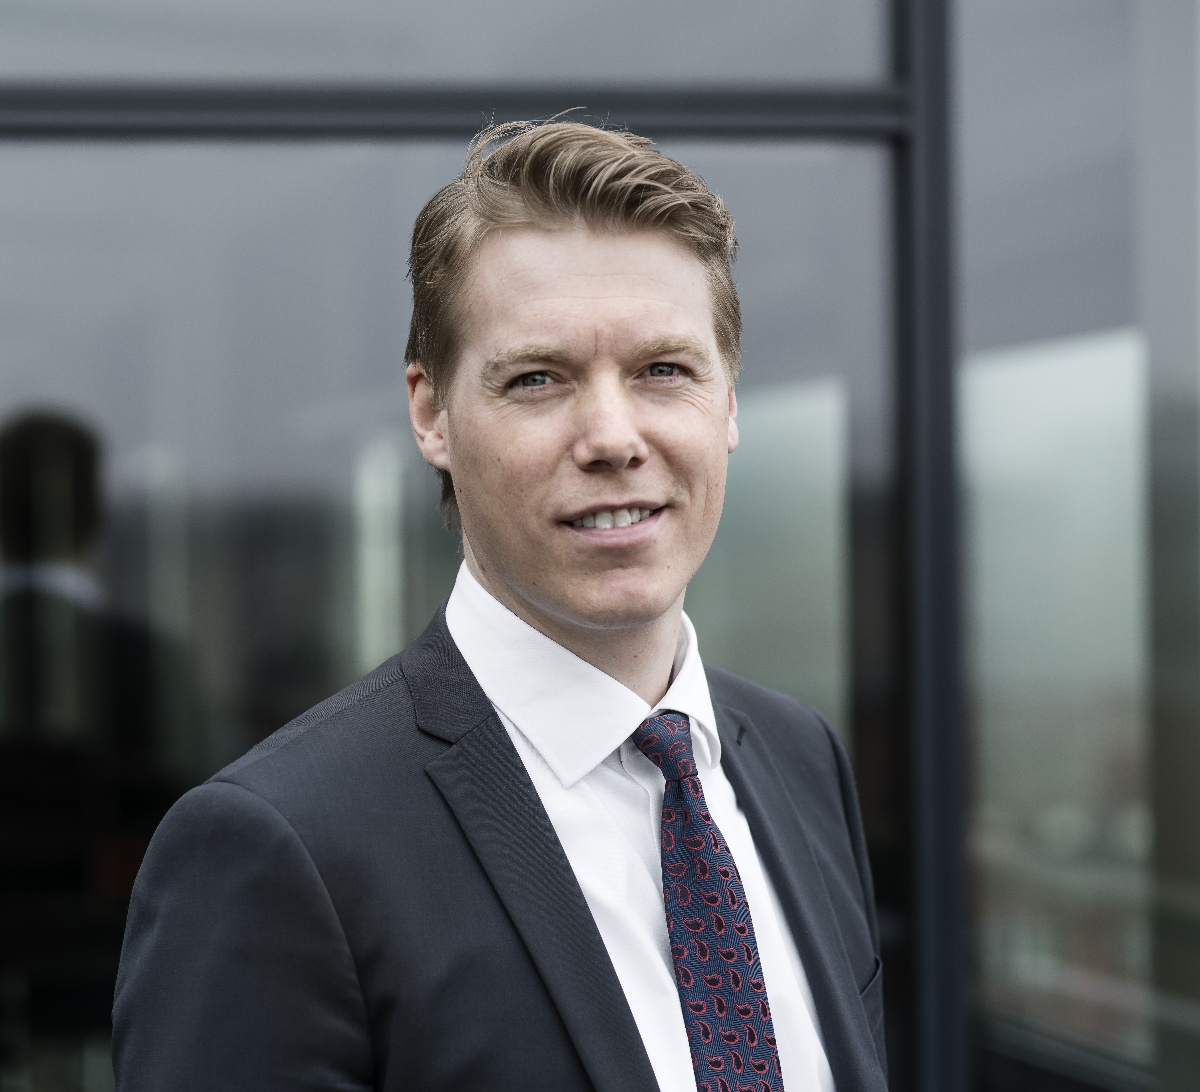 Mikkel Friis-Thomsen